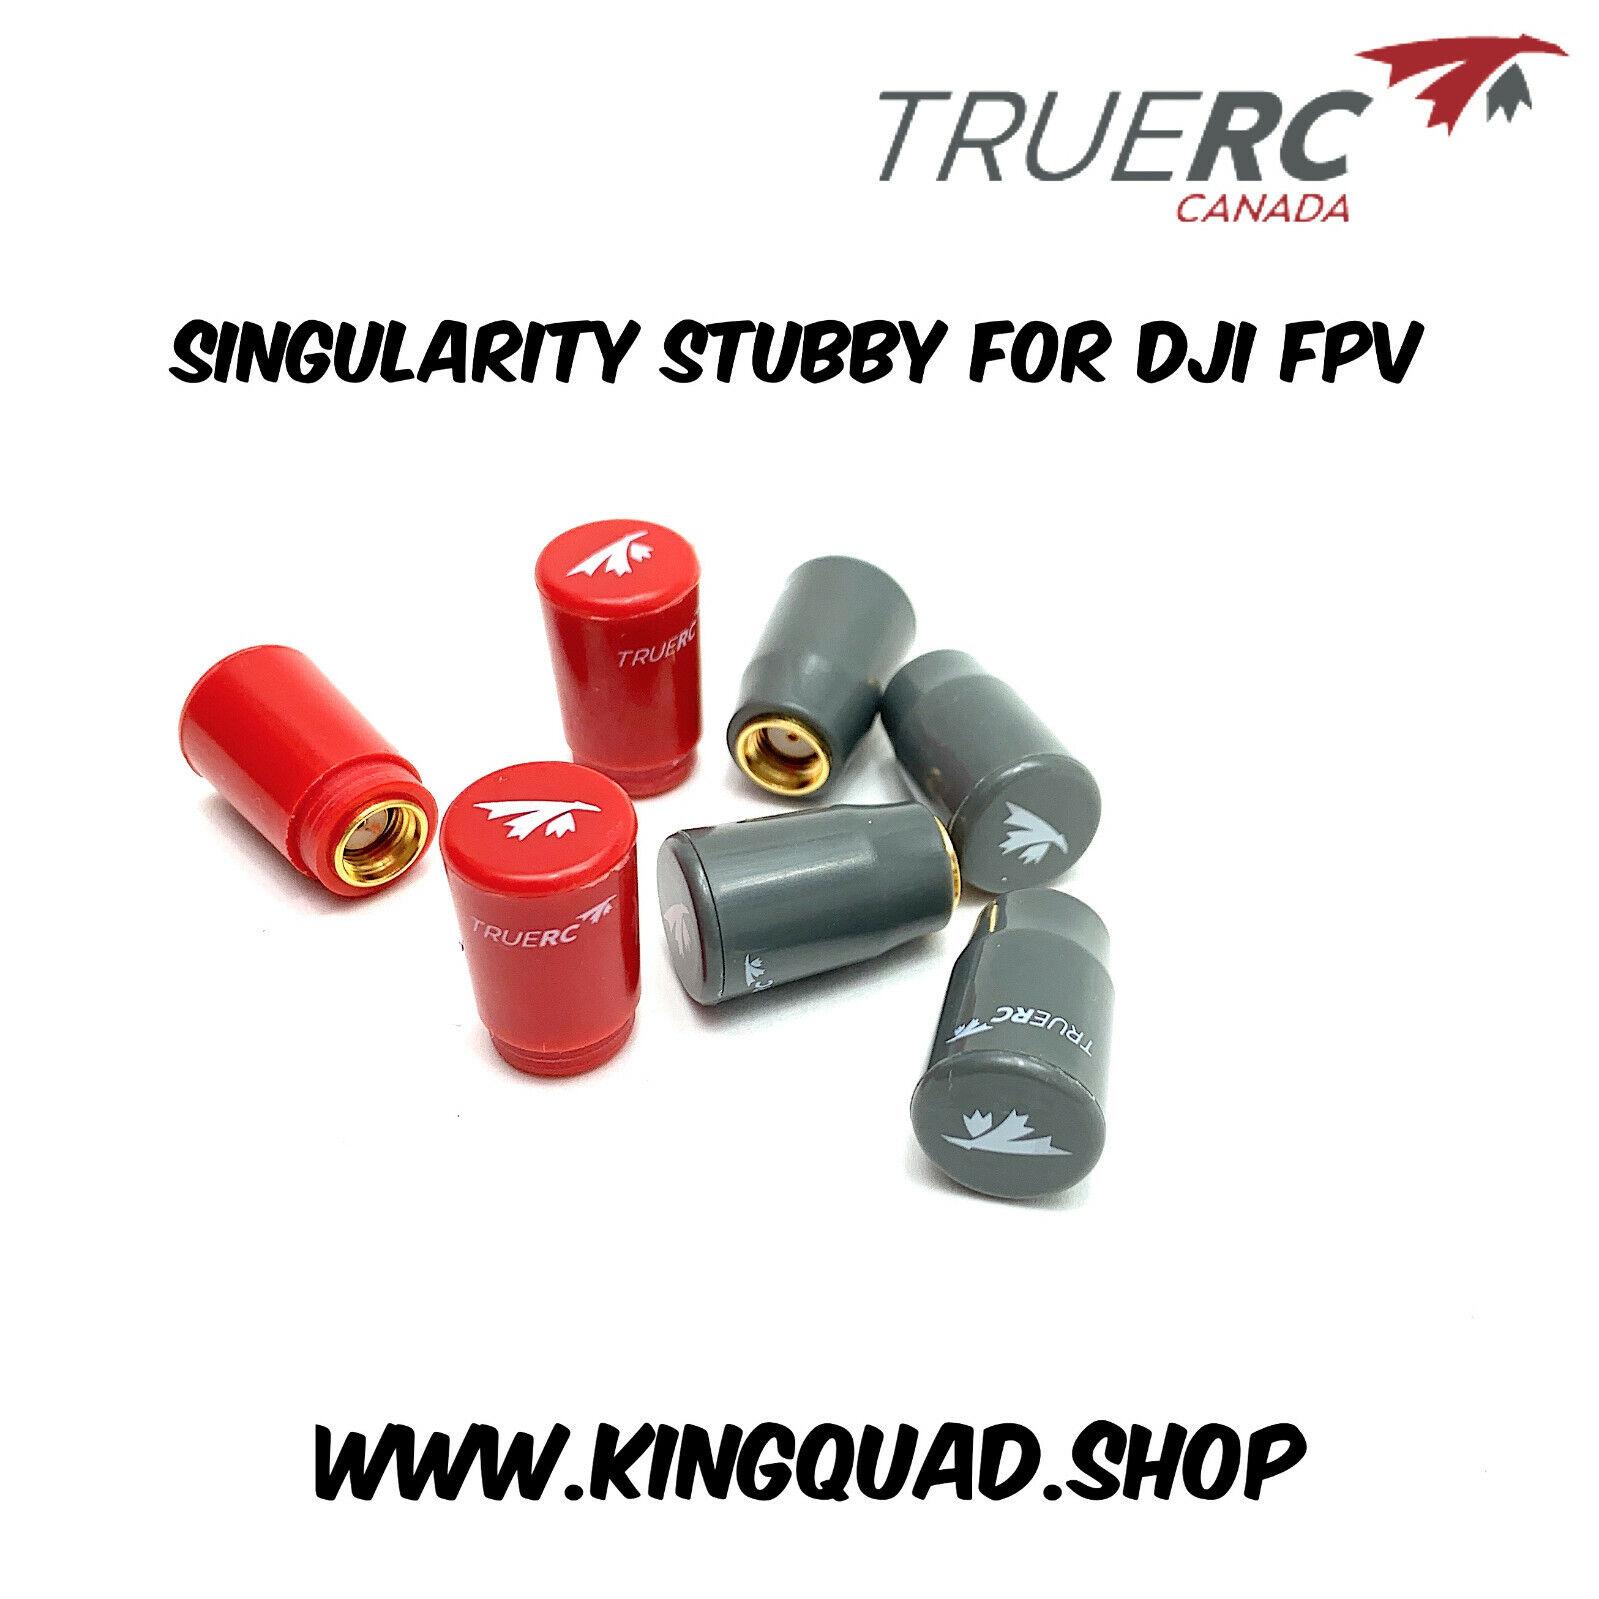 TrueRC Singularity Stubby 5.8GHz DJI Goggle Antennas (4 Pack)